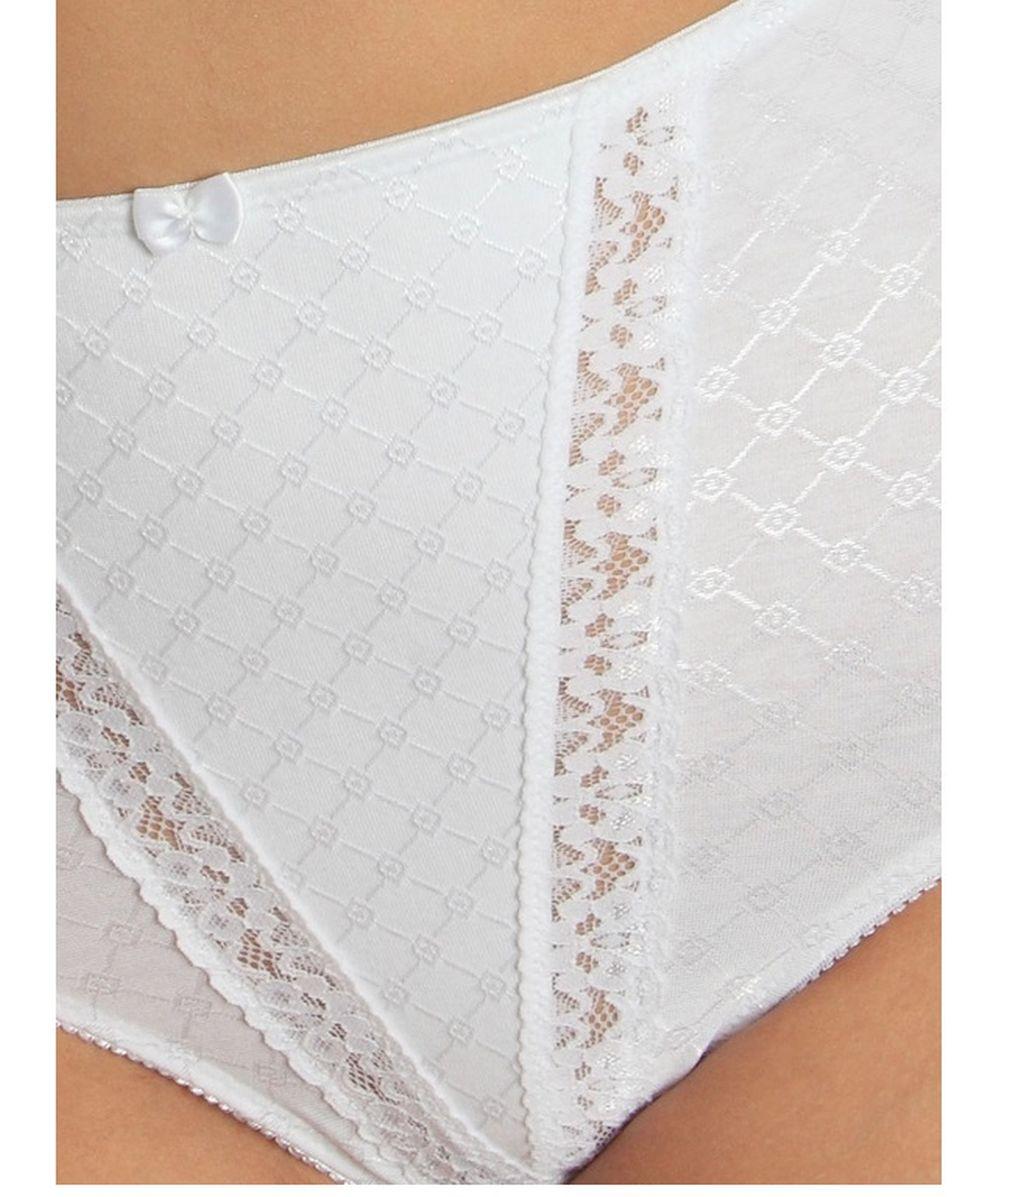 Sassa Damen Miederslip Panty Slip Bodyforming Shapewear 534 maxi Gr. 75 - 95